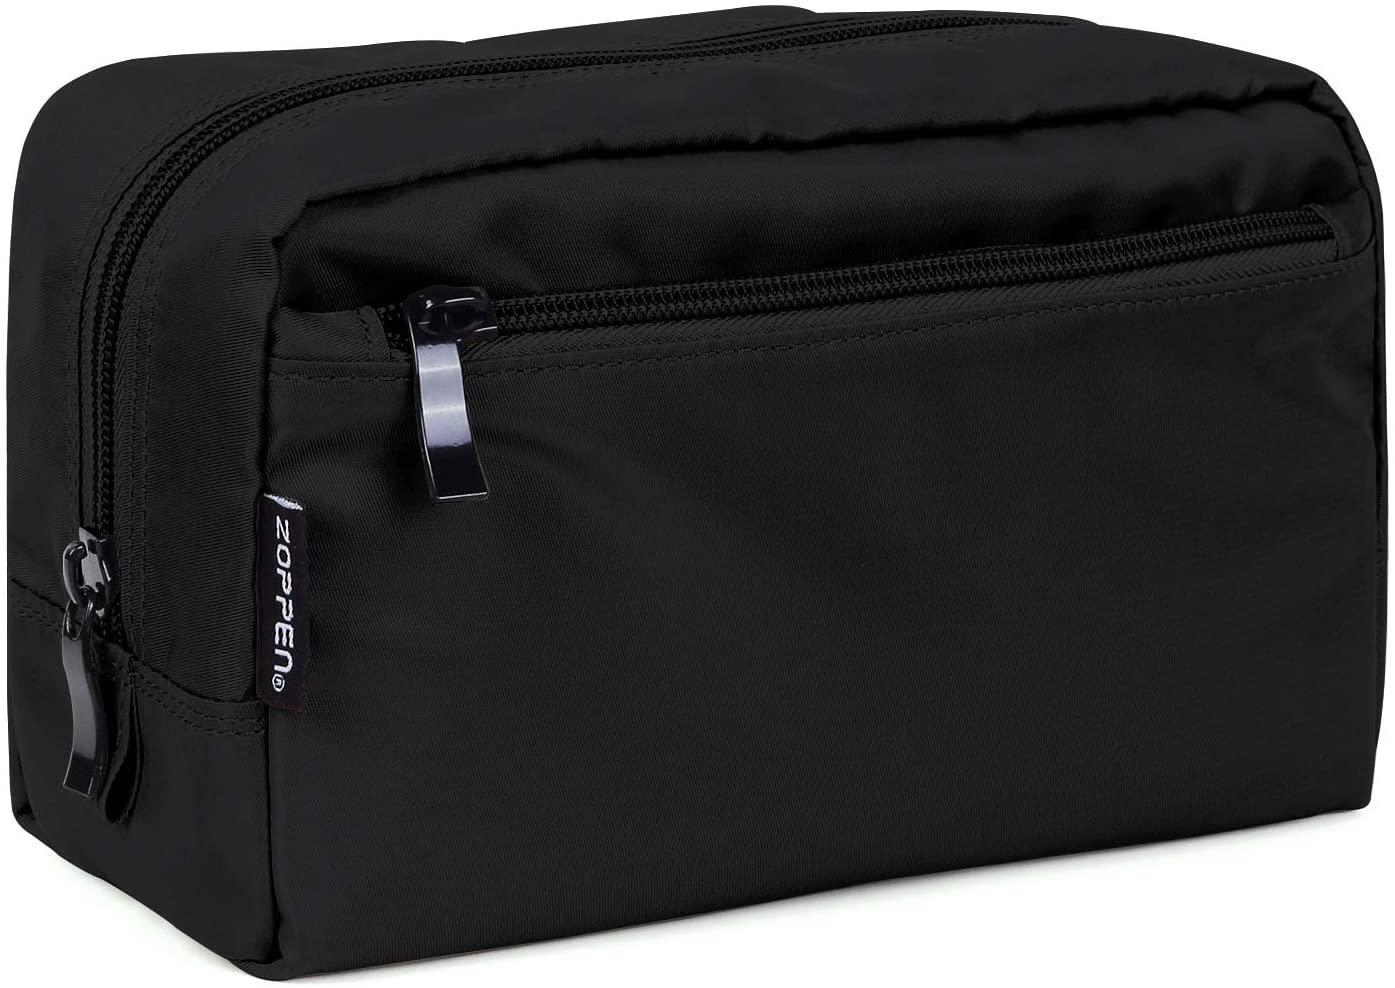 Zoppen Makeup Organizer Travel Accessories Makeup Case Waterproof Toiletry Cosmetic Bag, Black